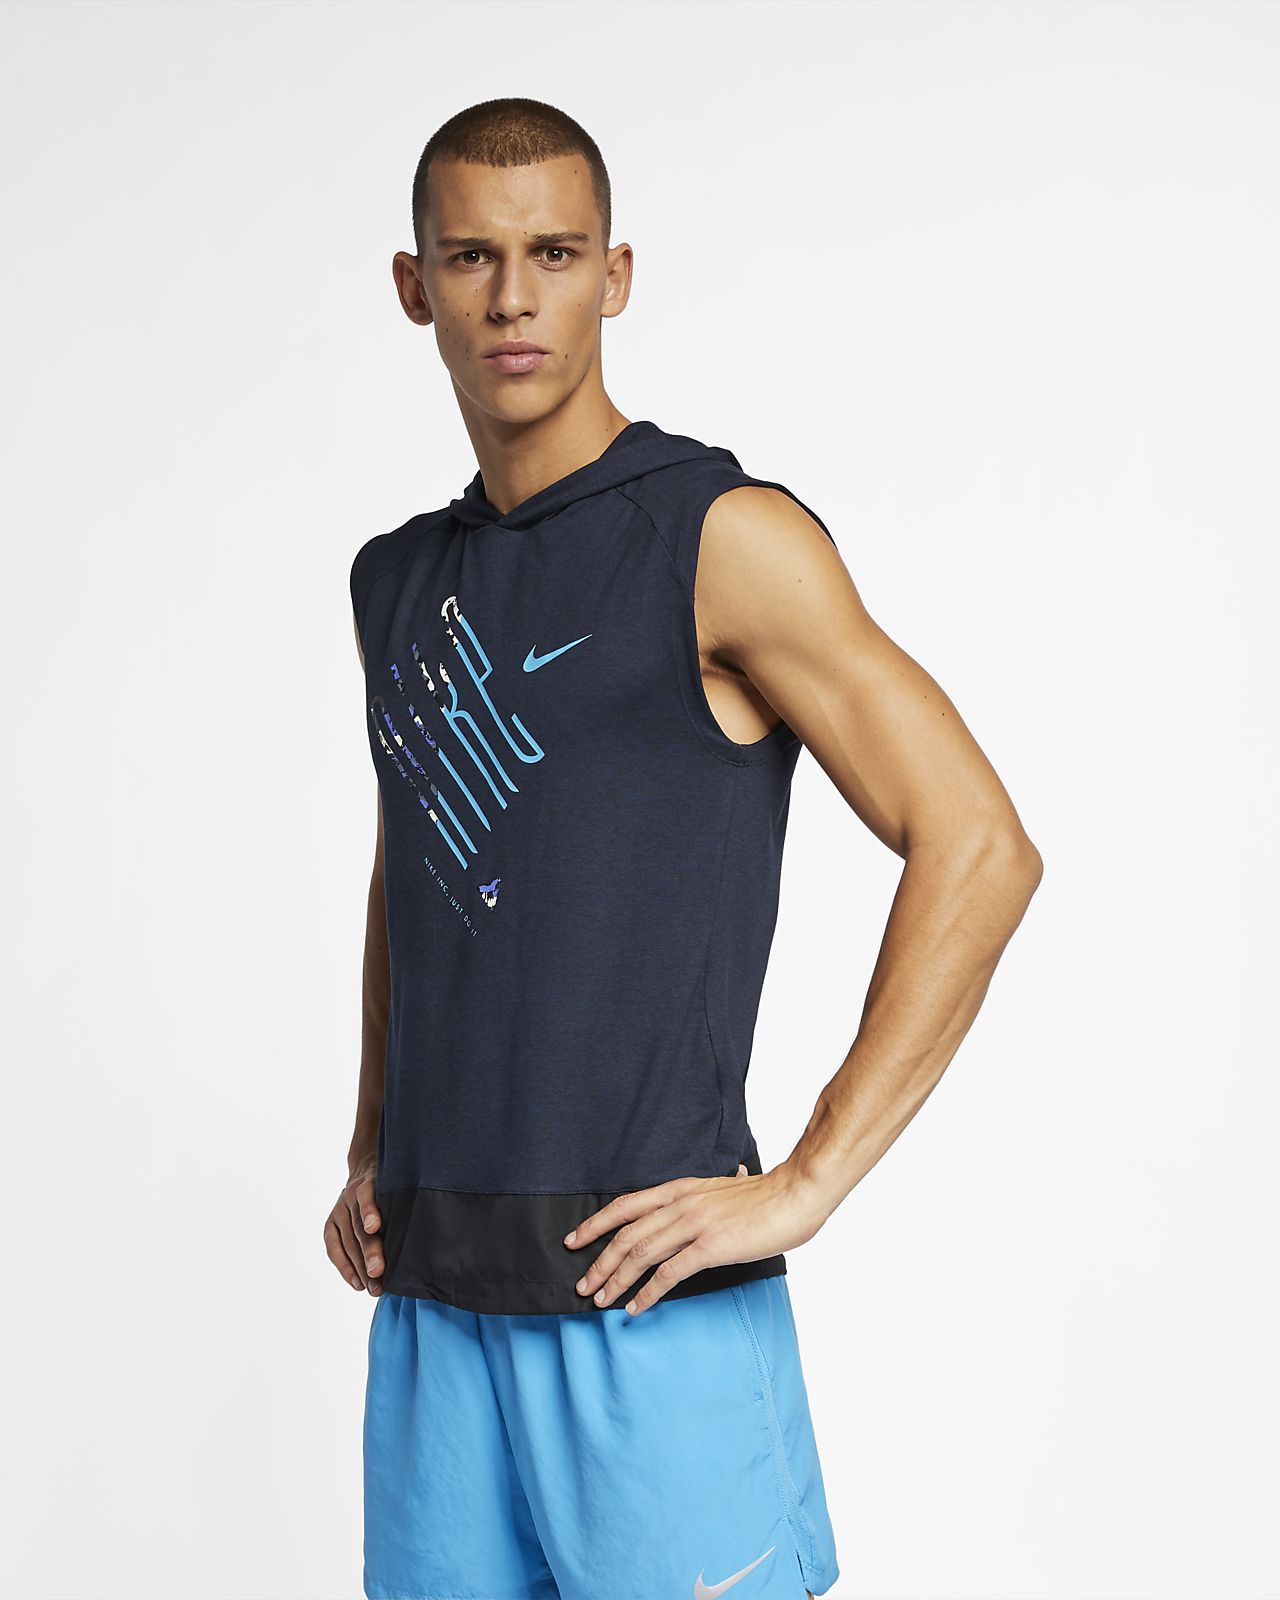 Nike Element Men's Sleeveless Running Top